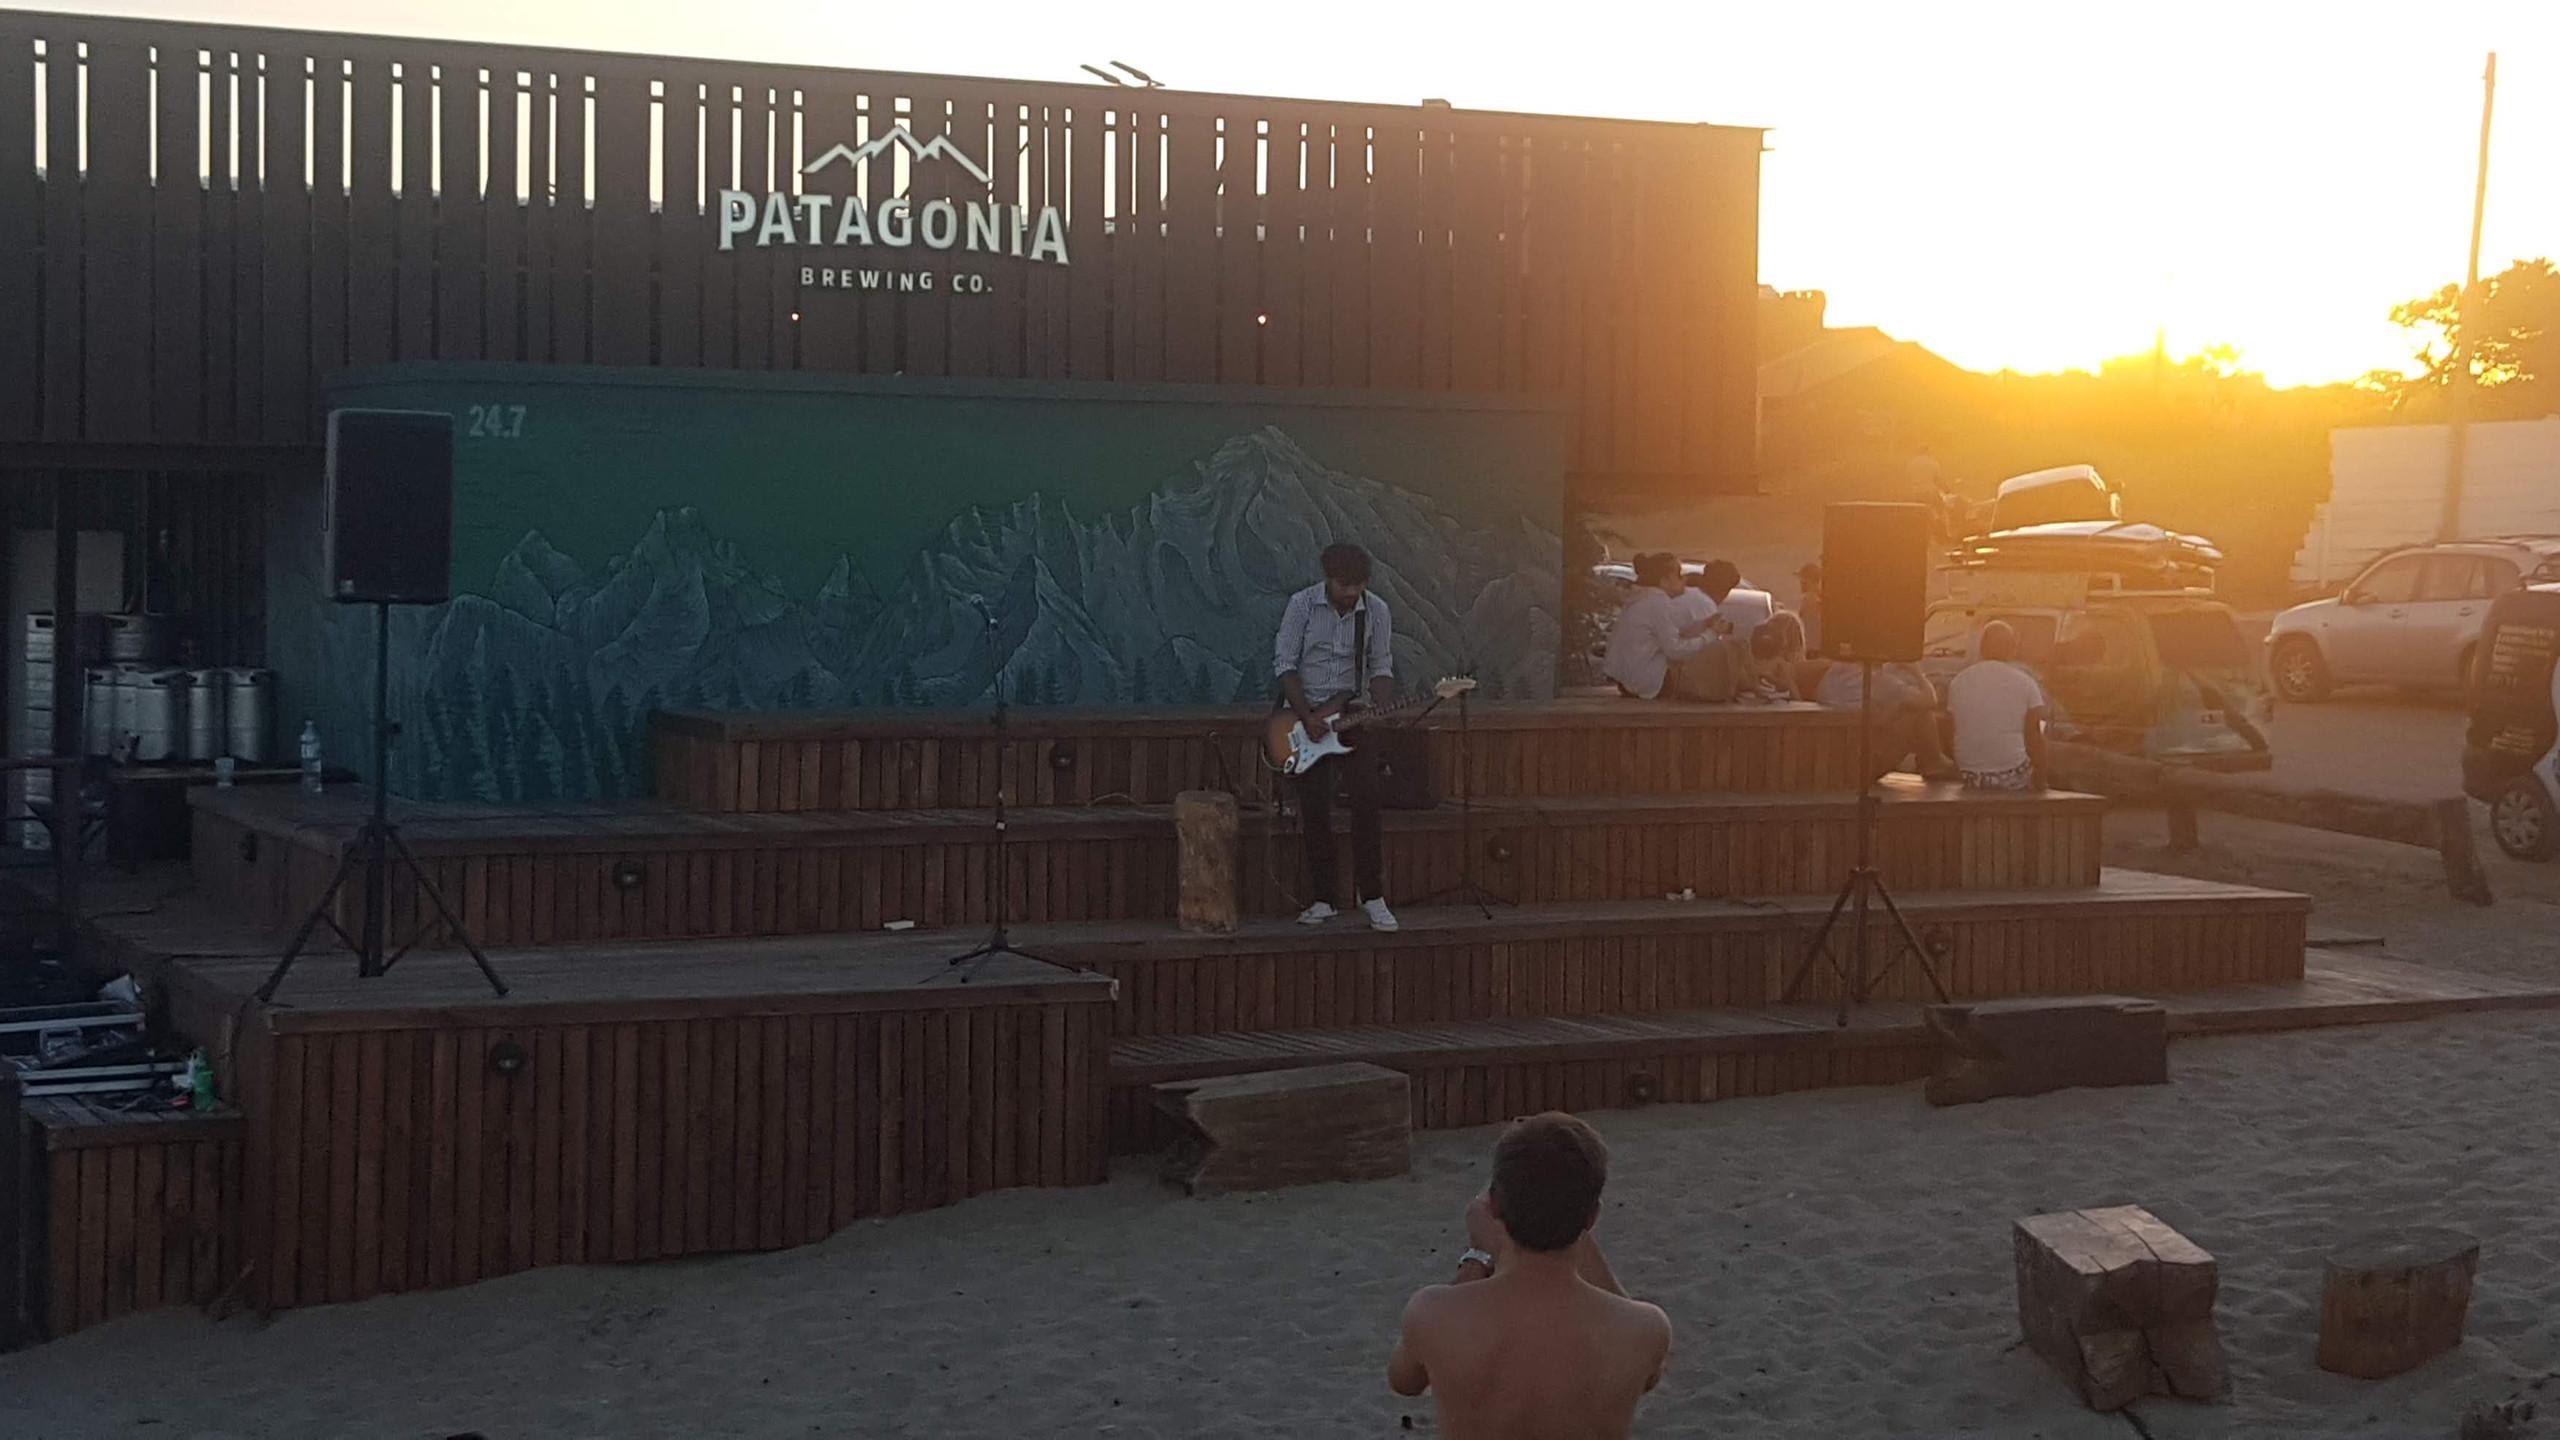 Afterbeach - Cerveza Patagonia